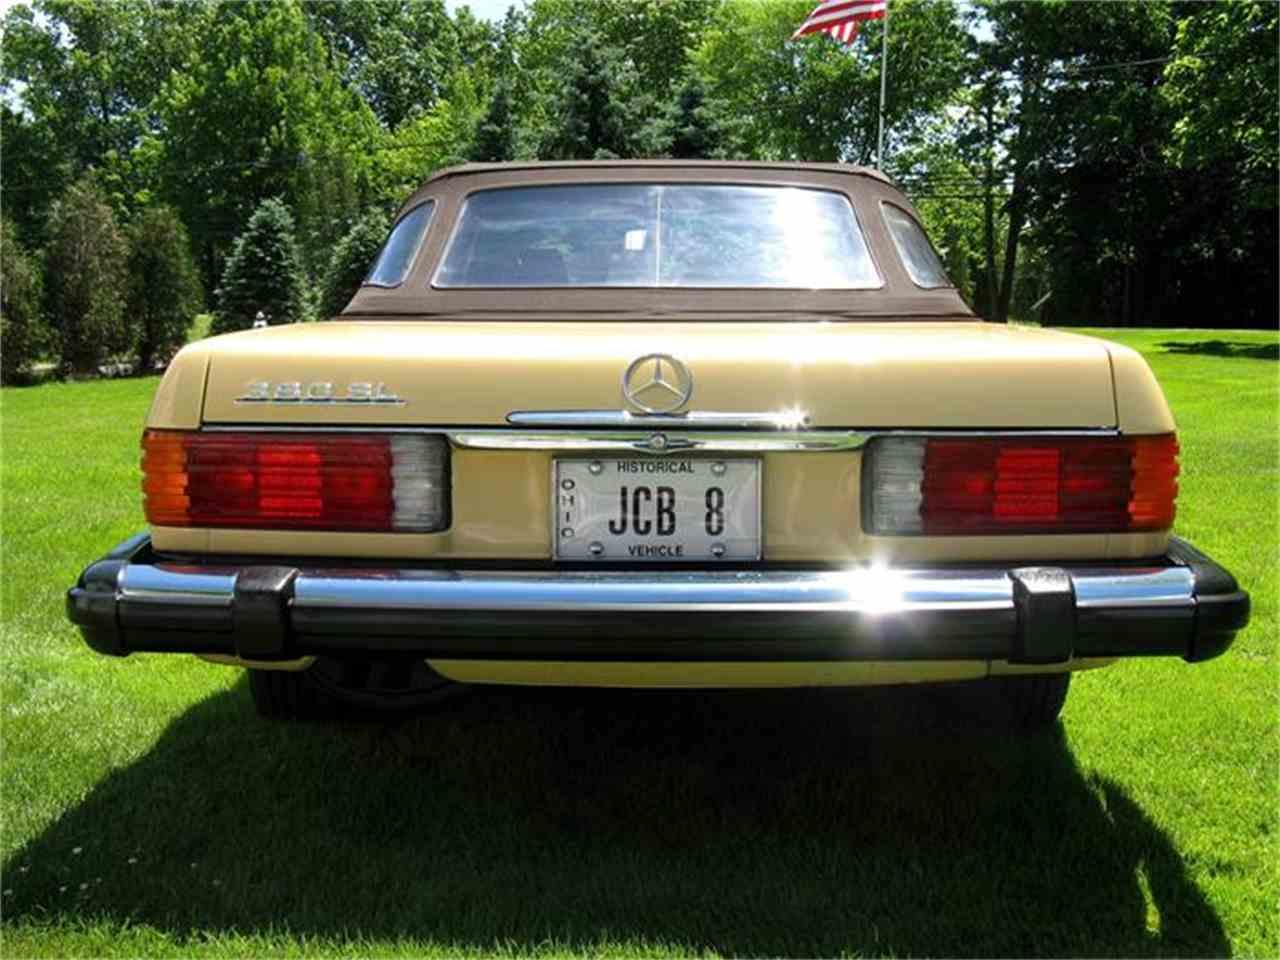 Classic Cars Shaker Heights Ohio